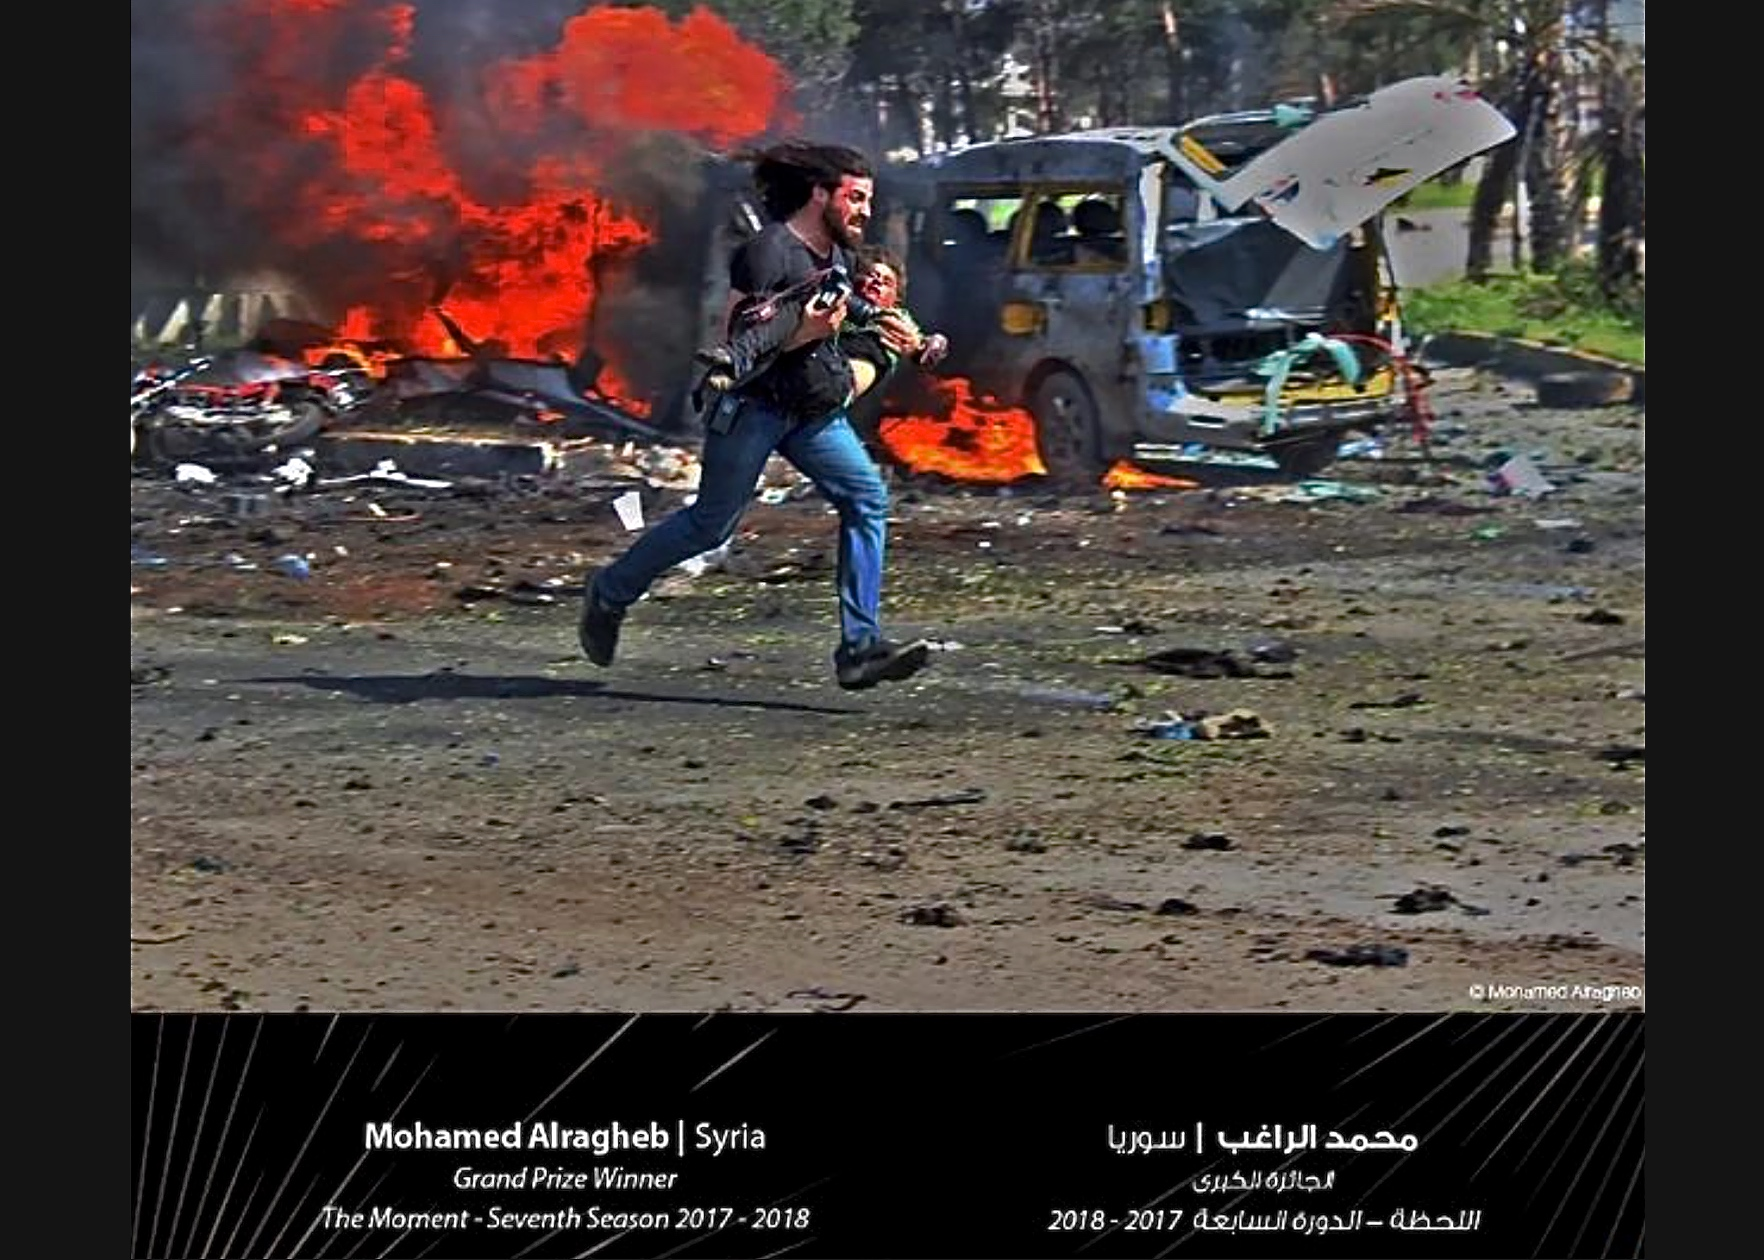 ©Mohammed Alragheb/Hamdan International Photography Awards